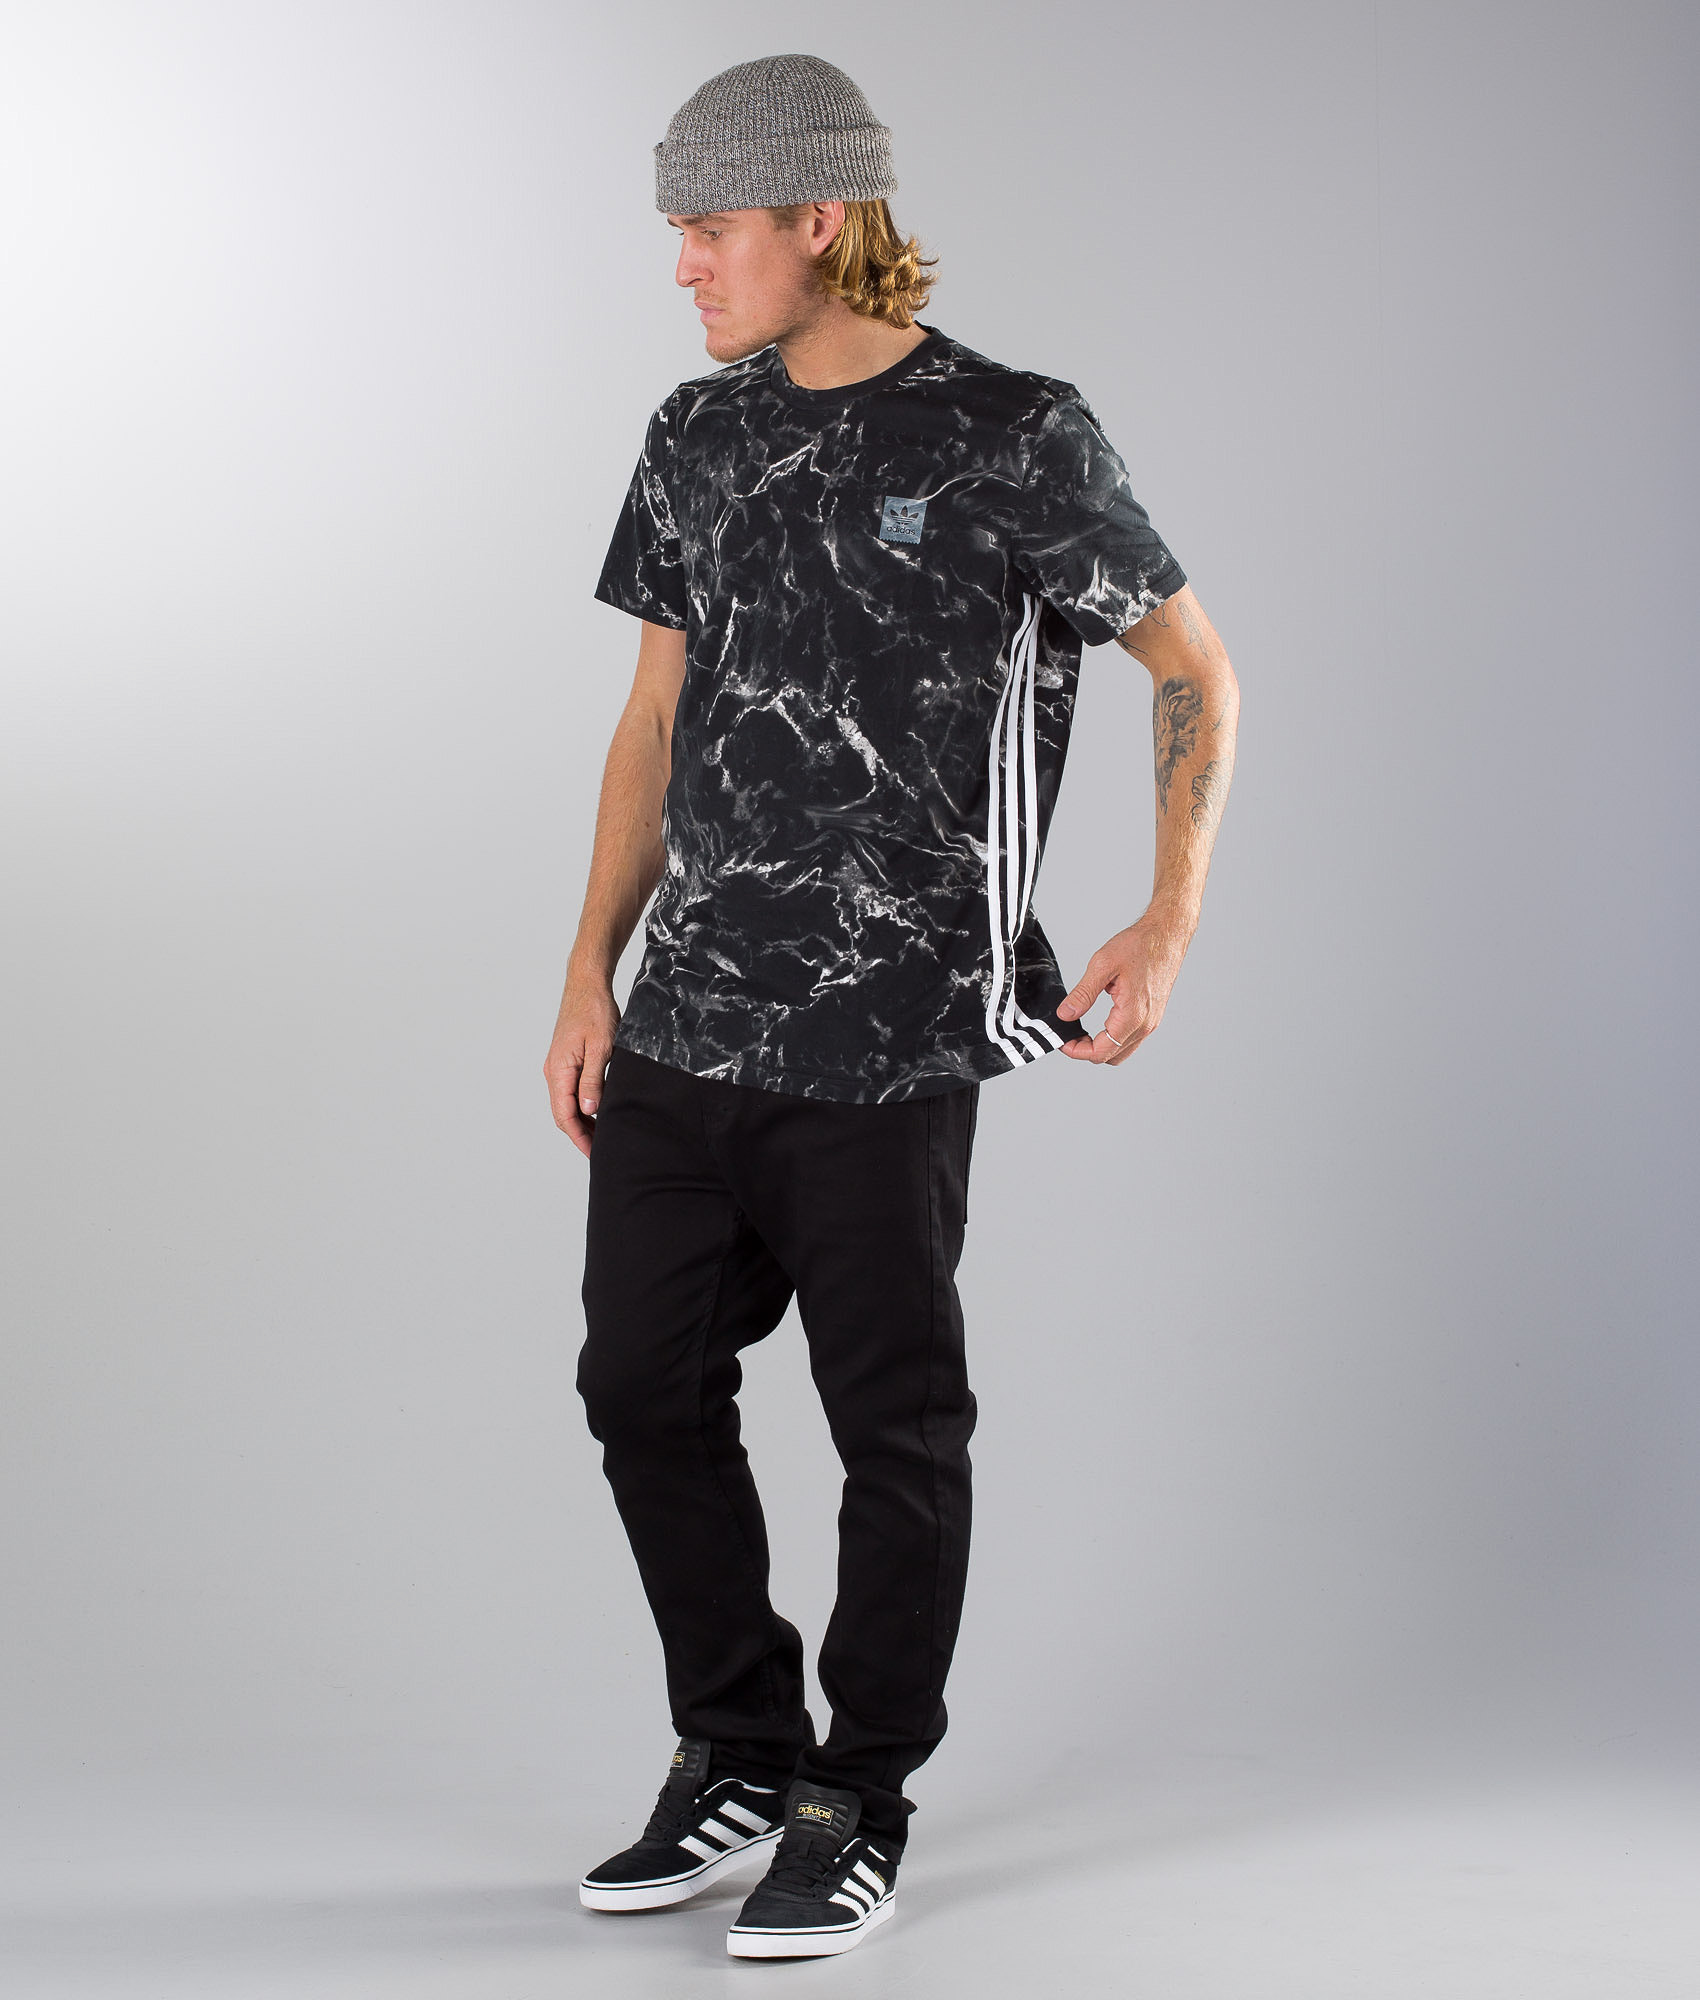 250a2cde Adidas Skateboarding Marble Stripe T-shirt Black/White - Ridestore.com